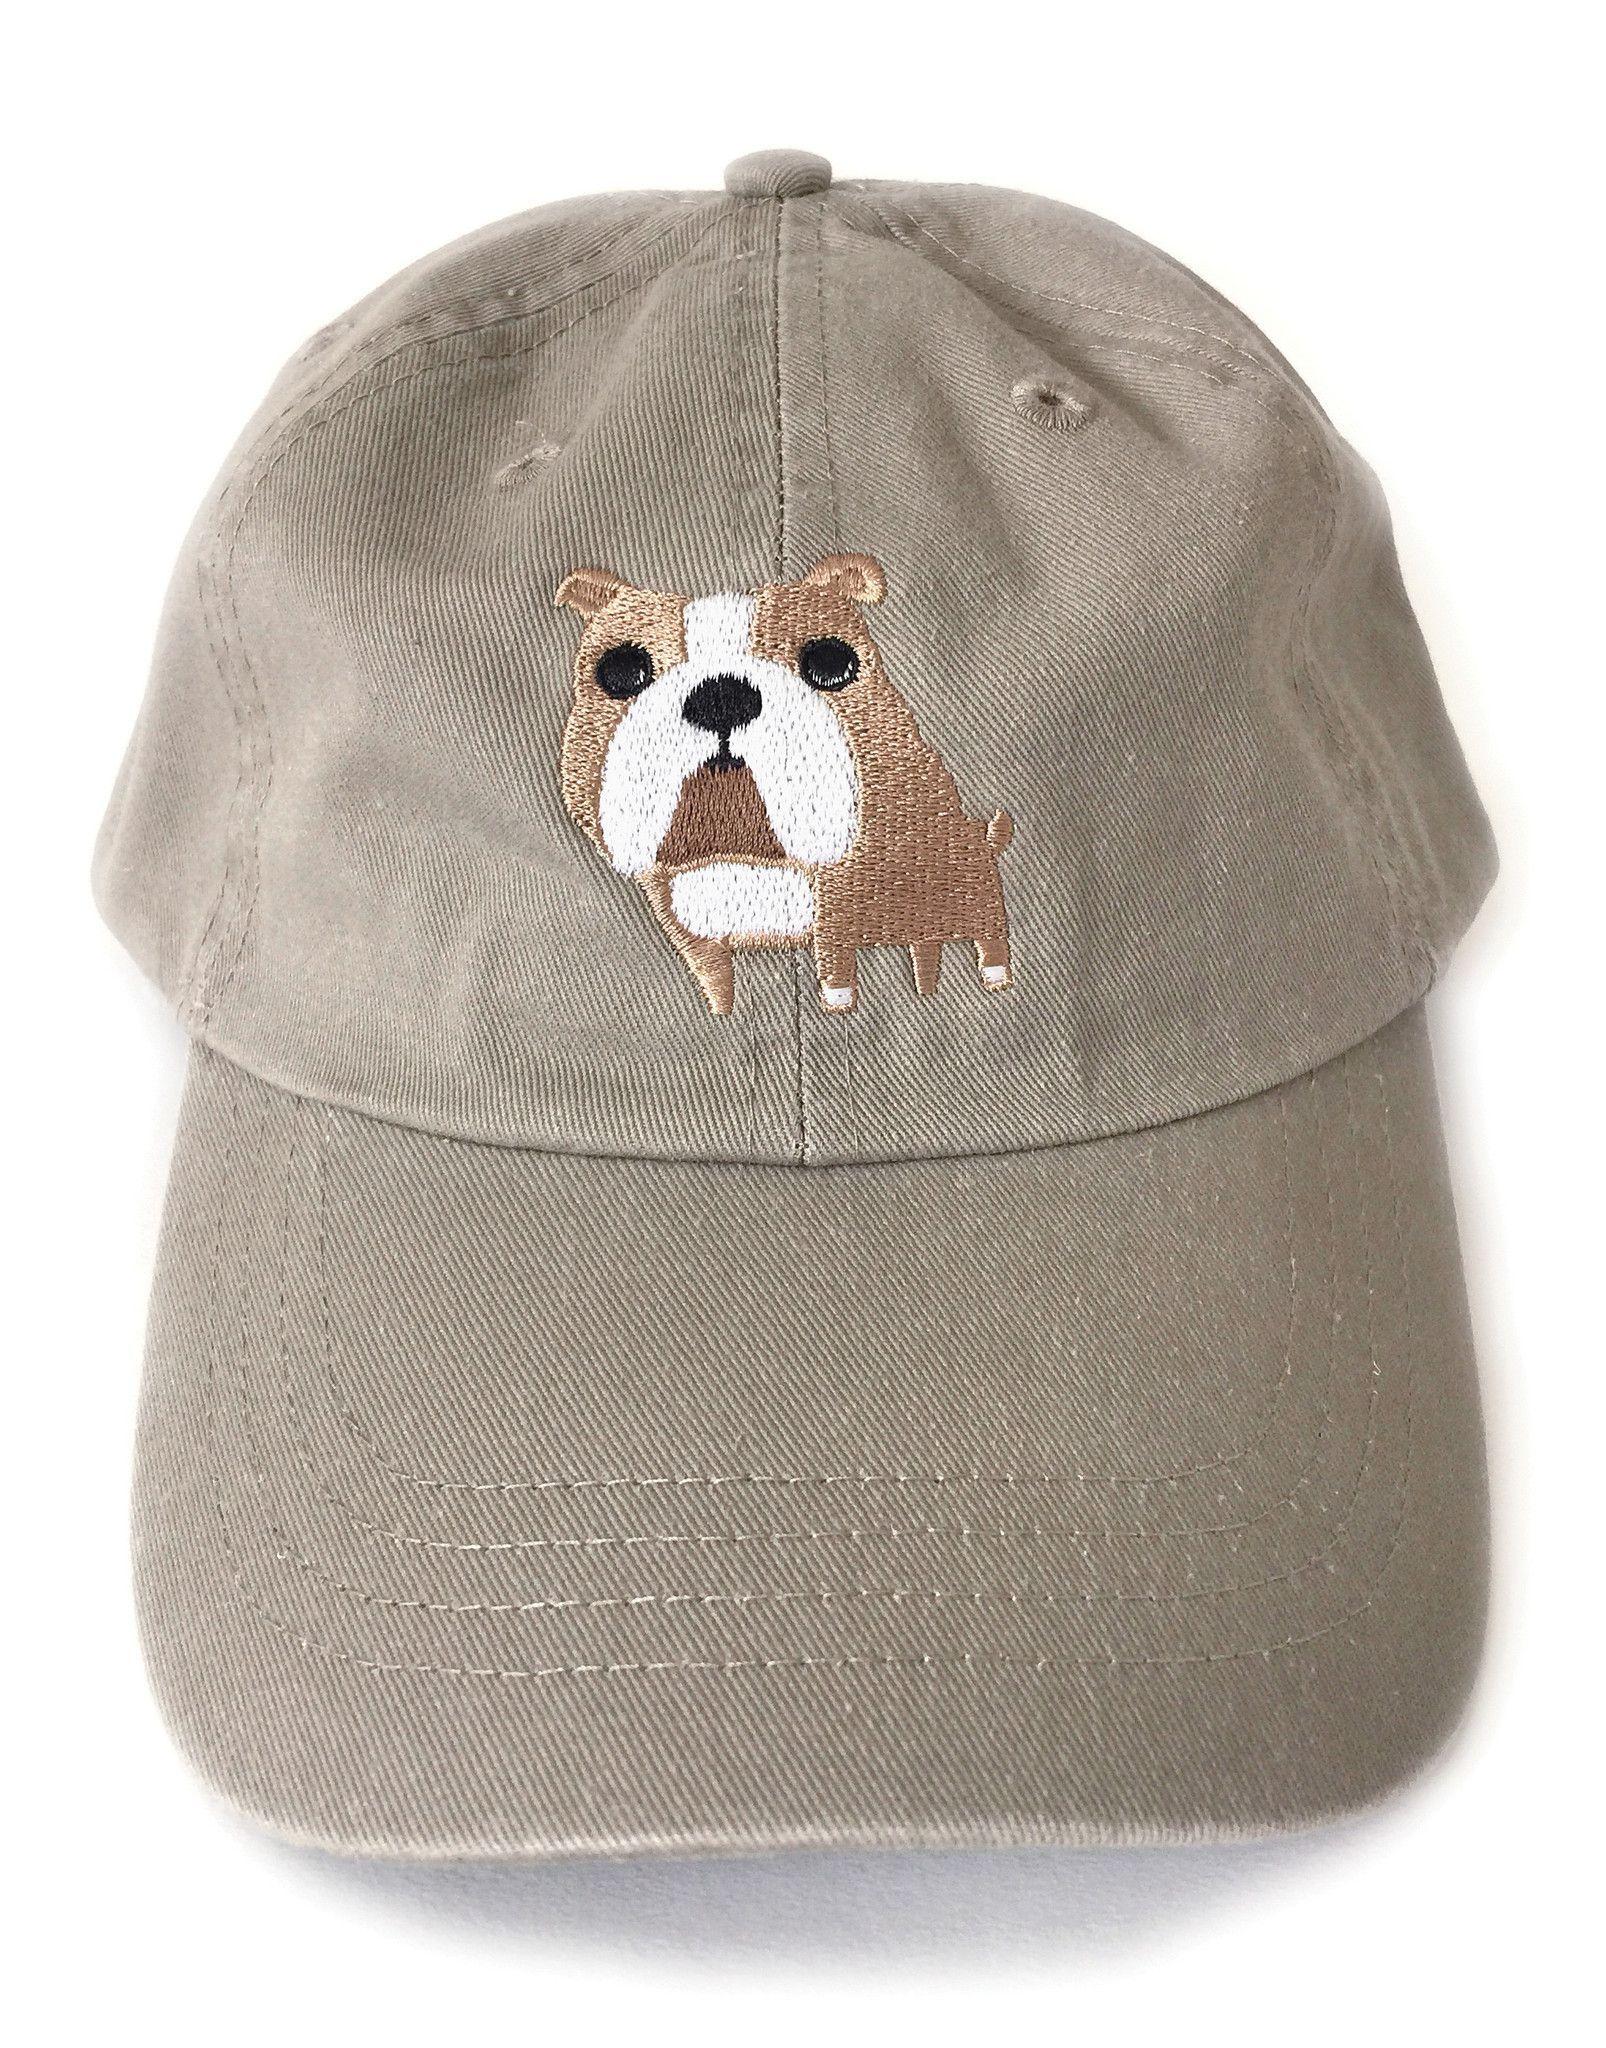 607cd5b6c90 Bulldog Embroidered Baseball Cap